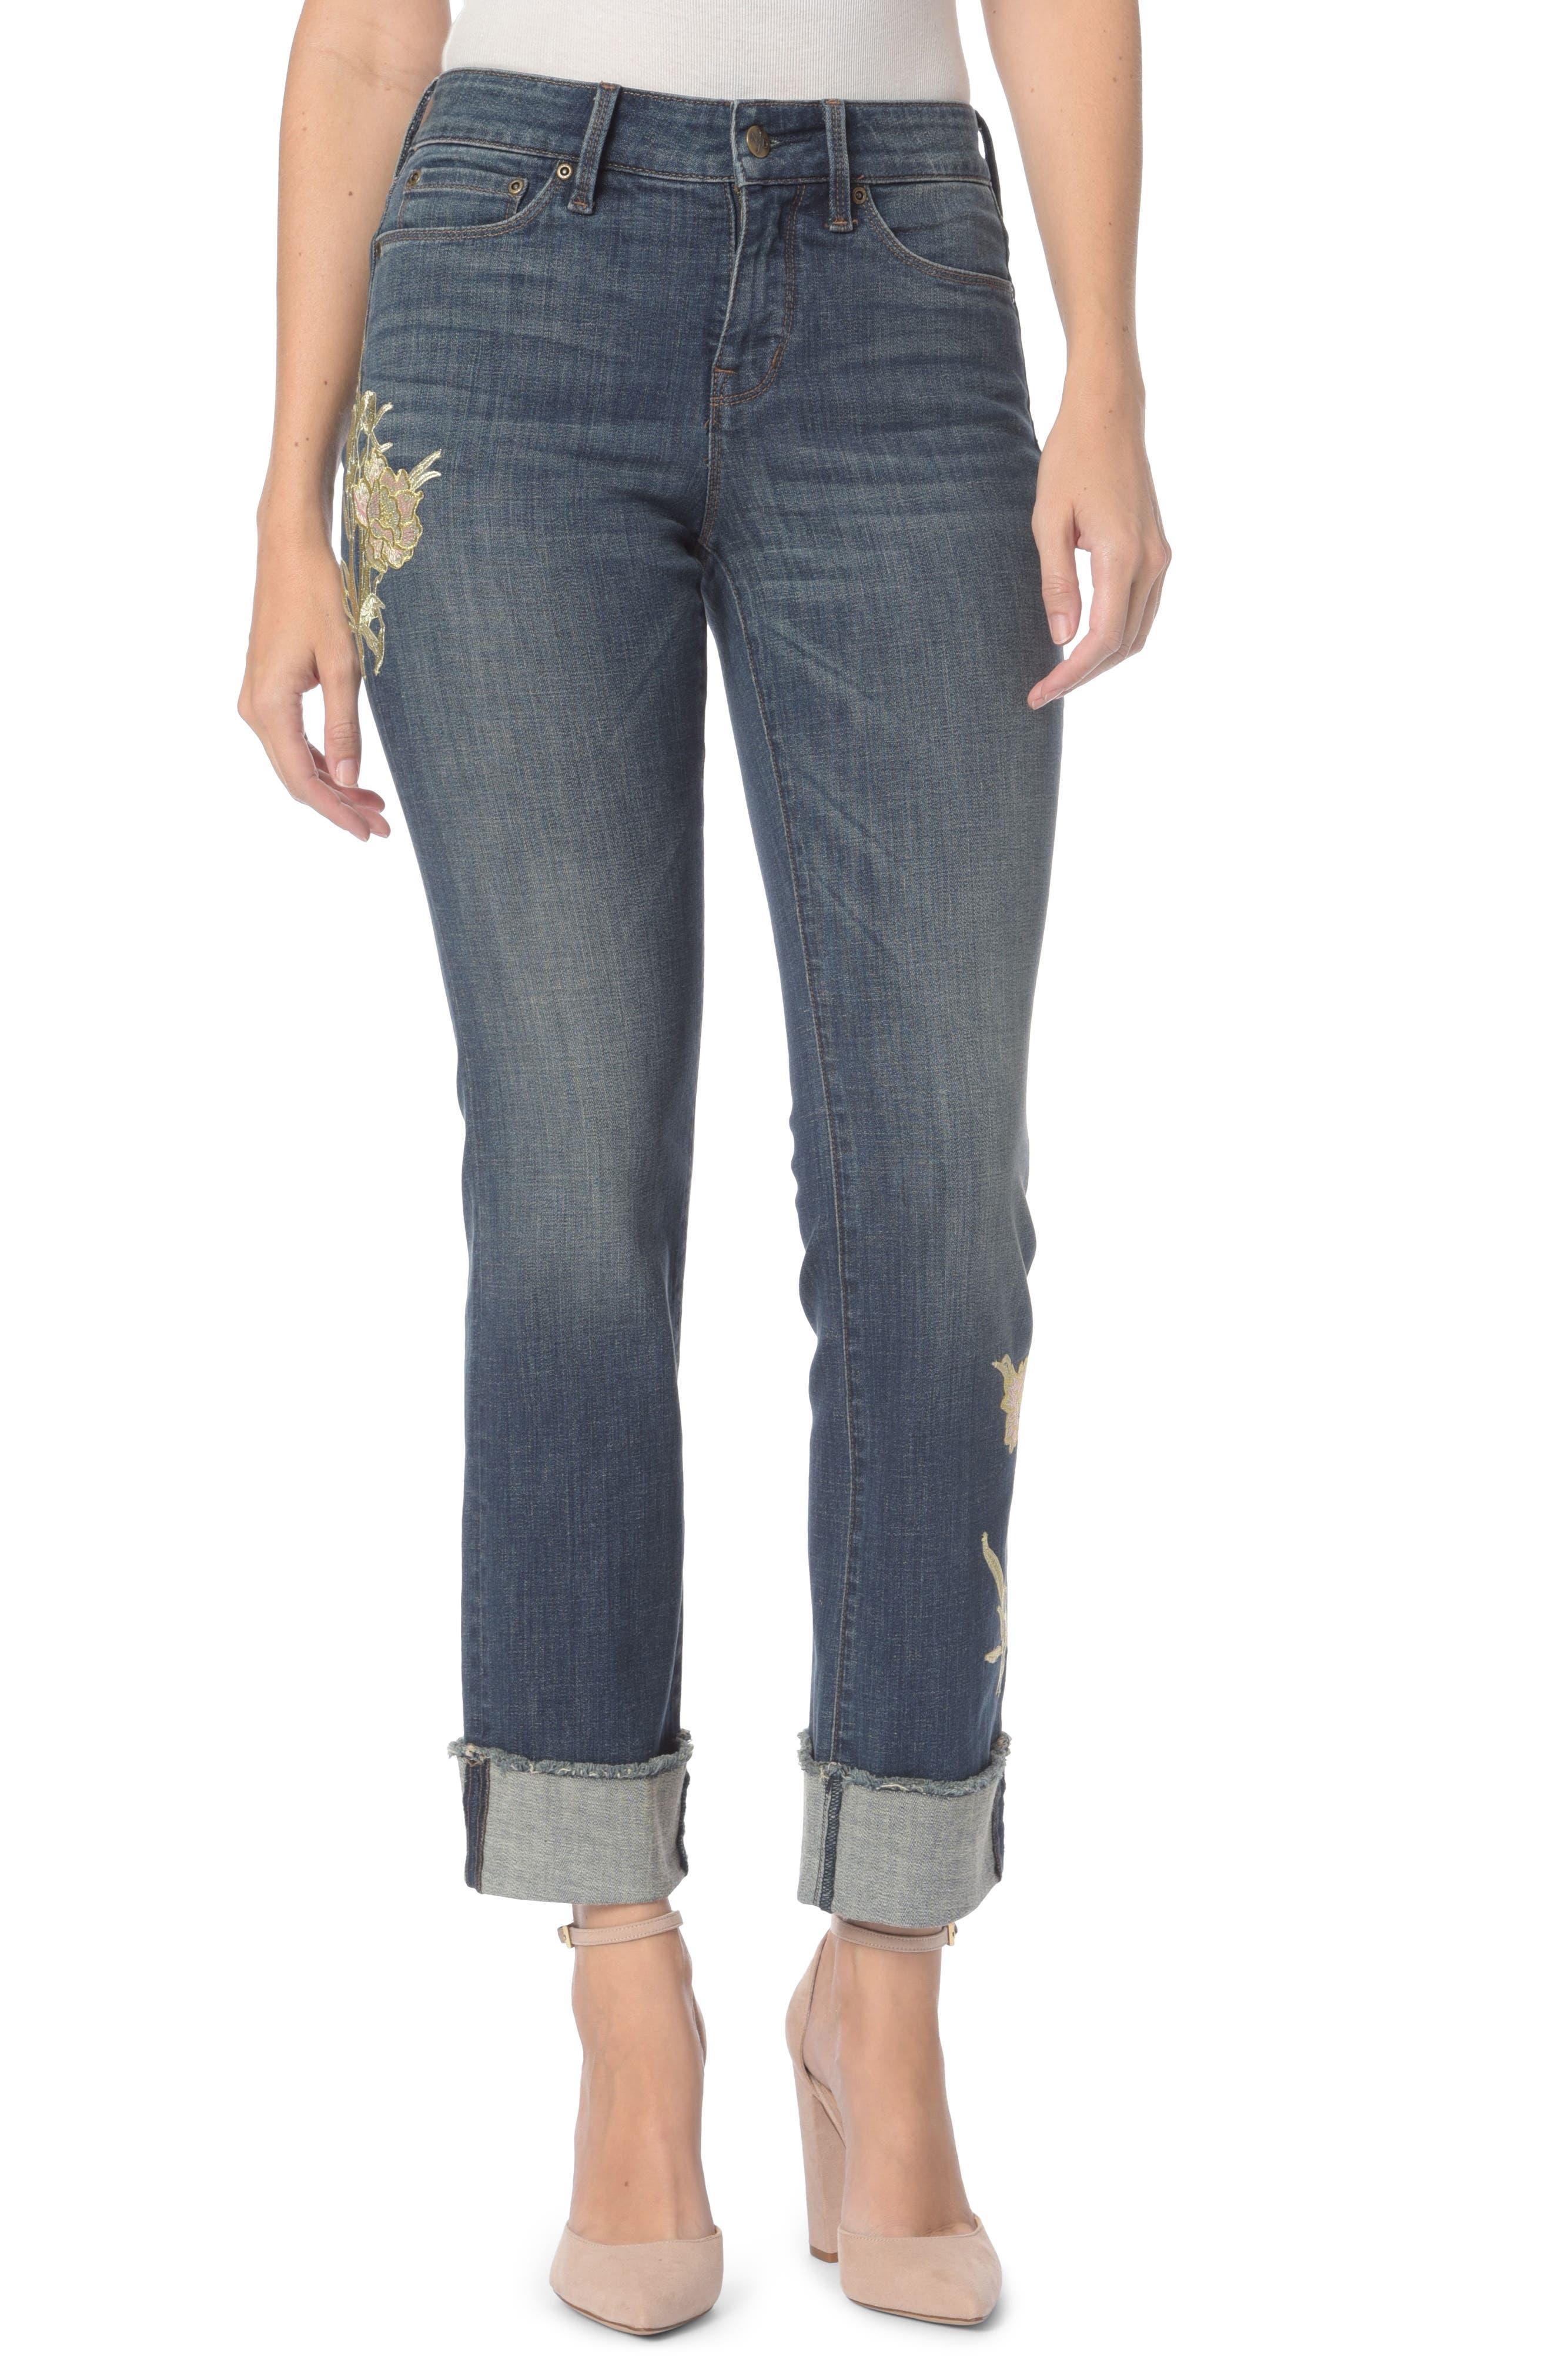 Marilyn Appliqué Stretch Straight Leg Ankle Jeans,                             Main thumbnail 1, color,                             Desert Gold